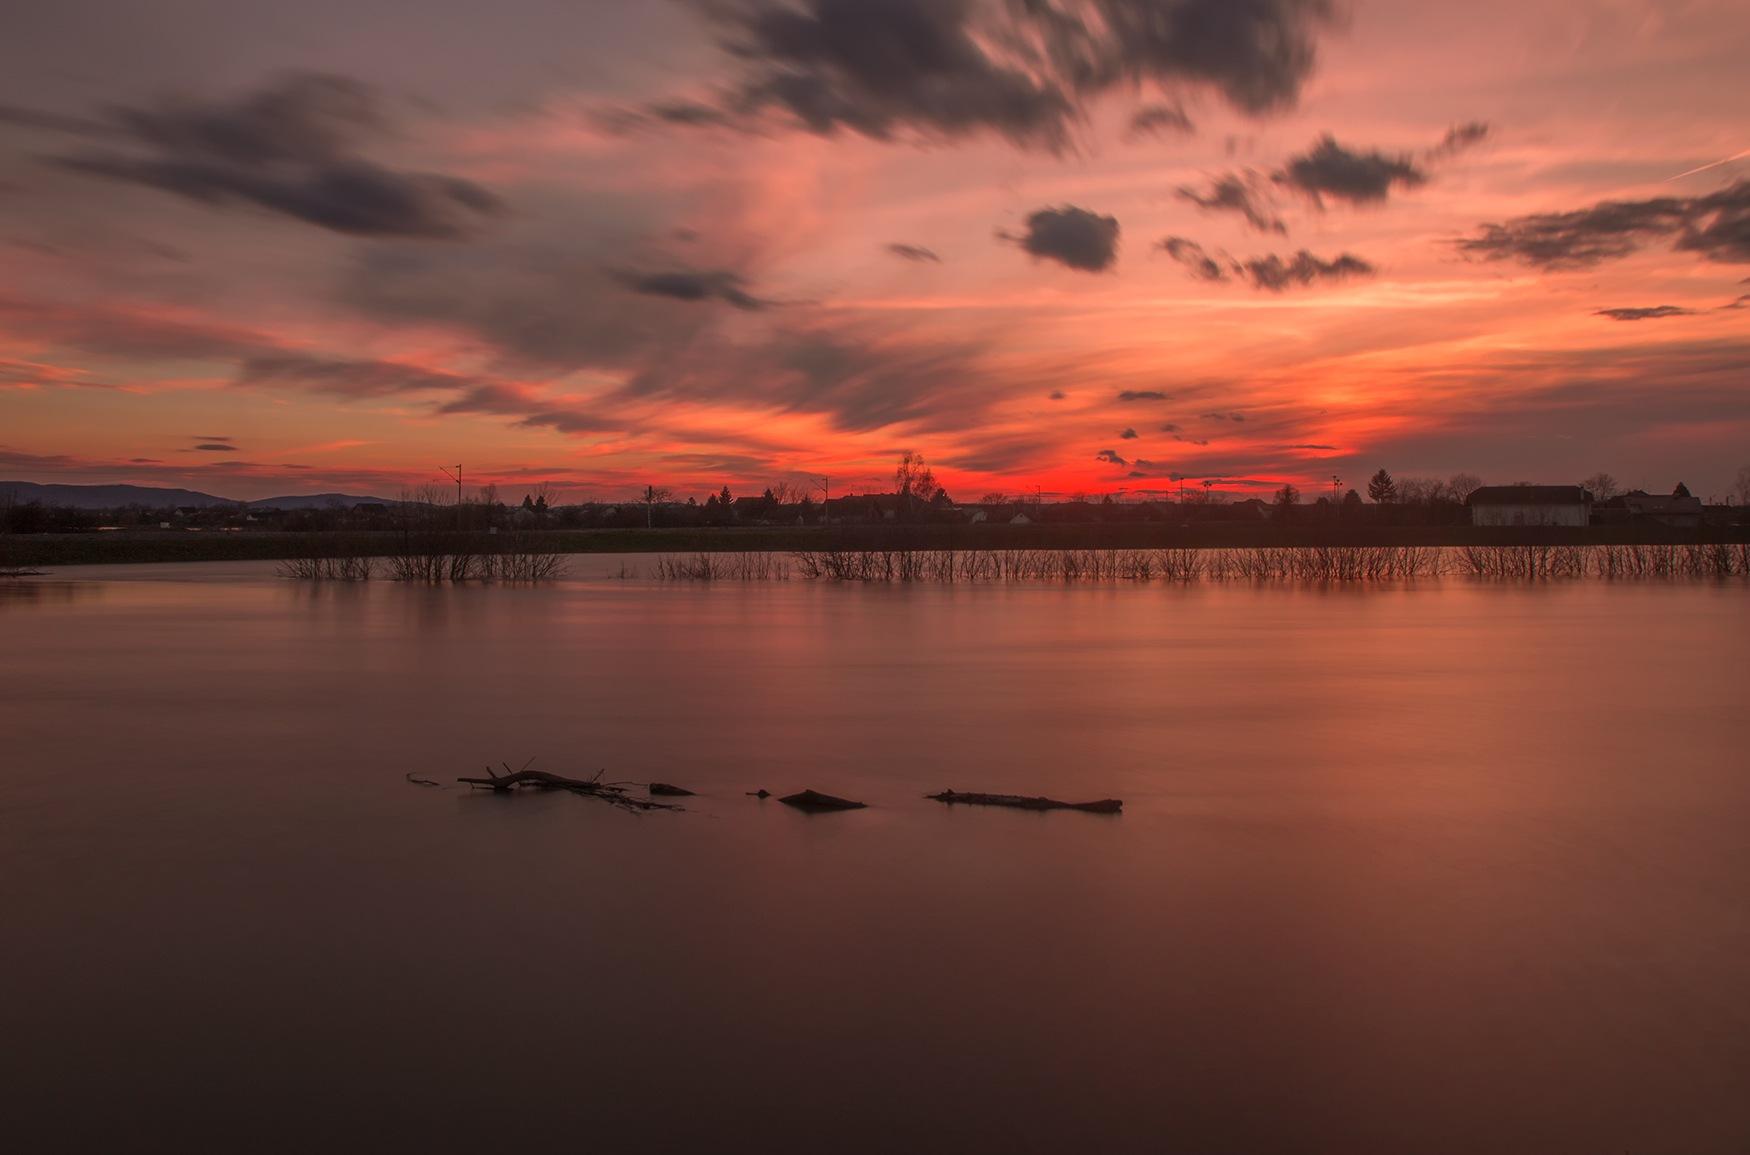 Sunset by zoki